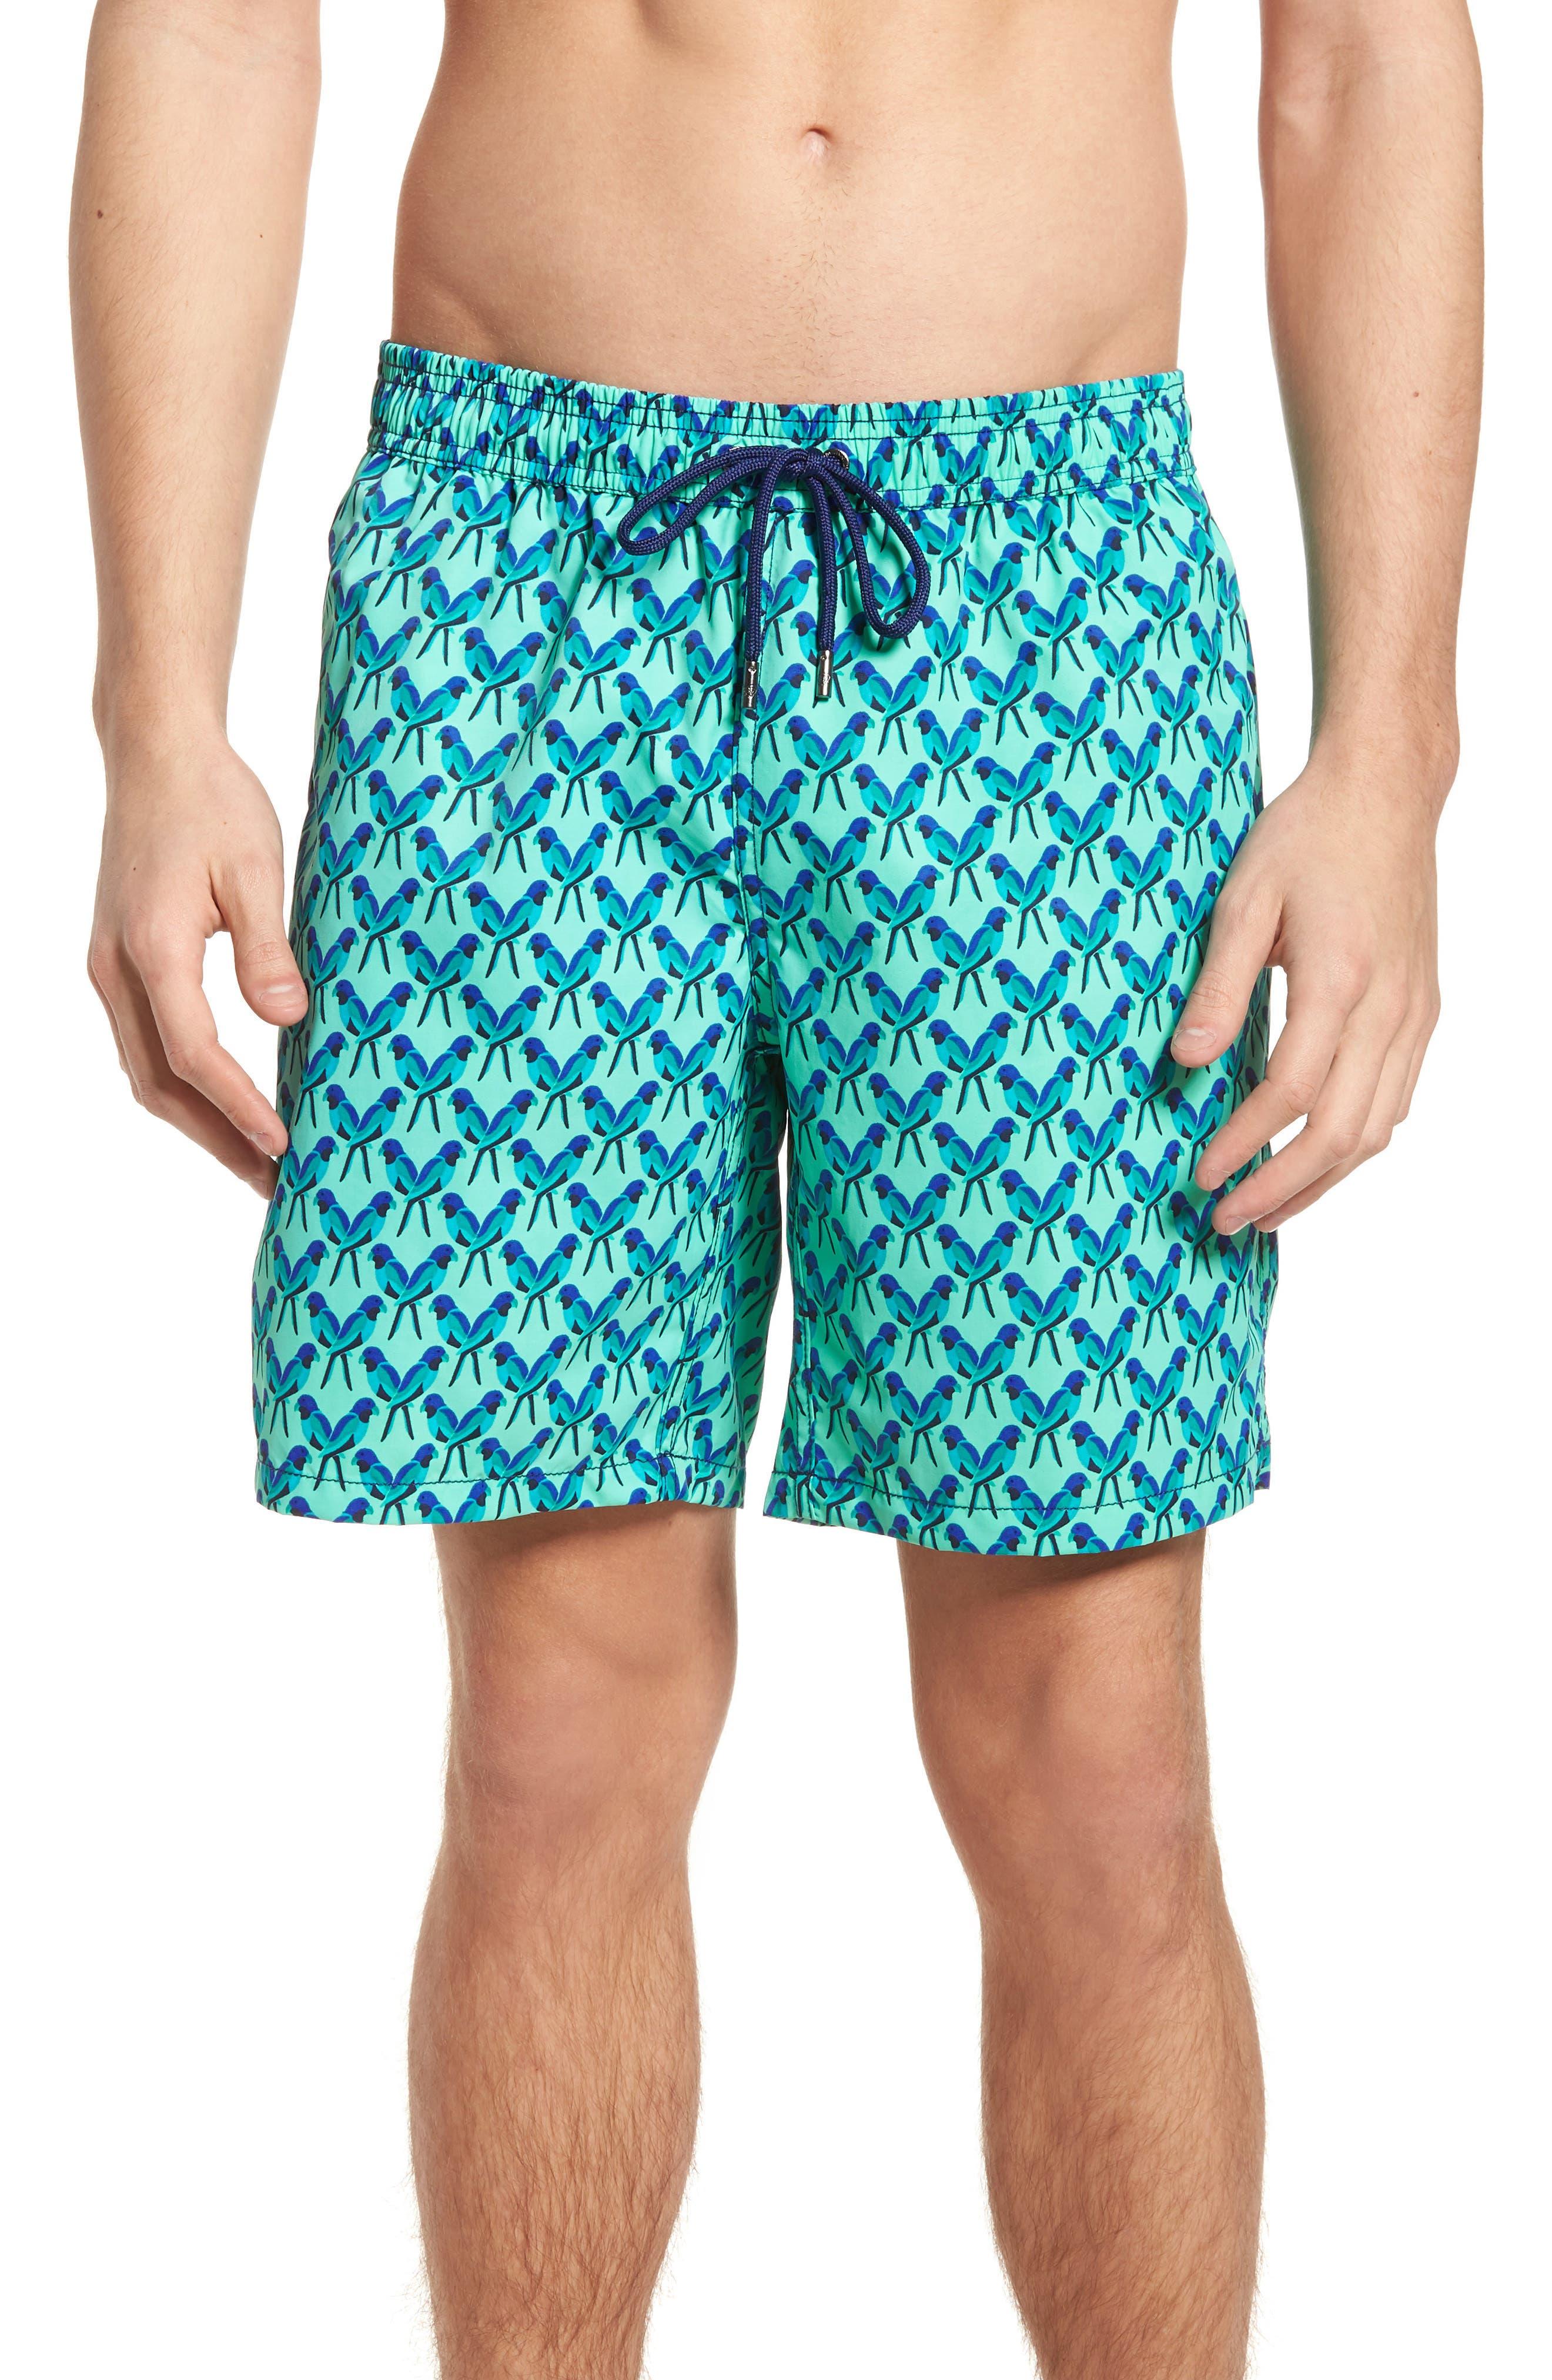 Mr. Swim Trim Fit Print Swim Trunks,                         Main,                         color, 321